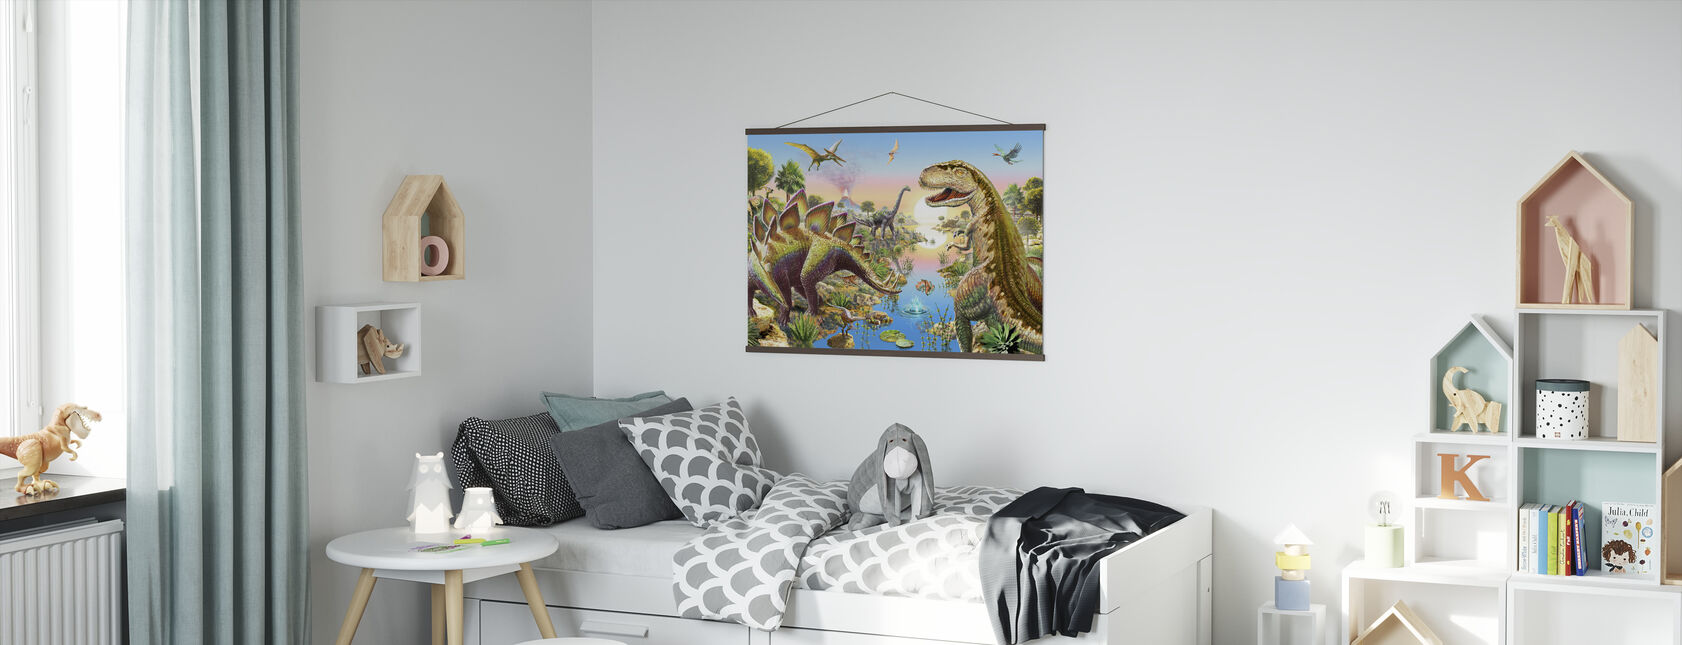 Jurassic - Poster - Kinderzimmer